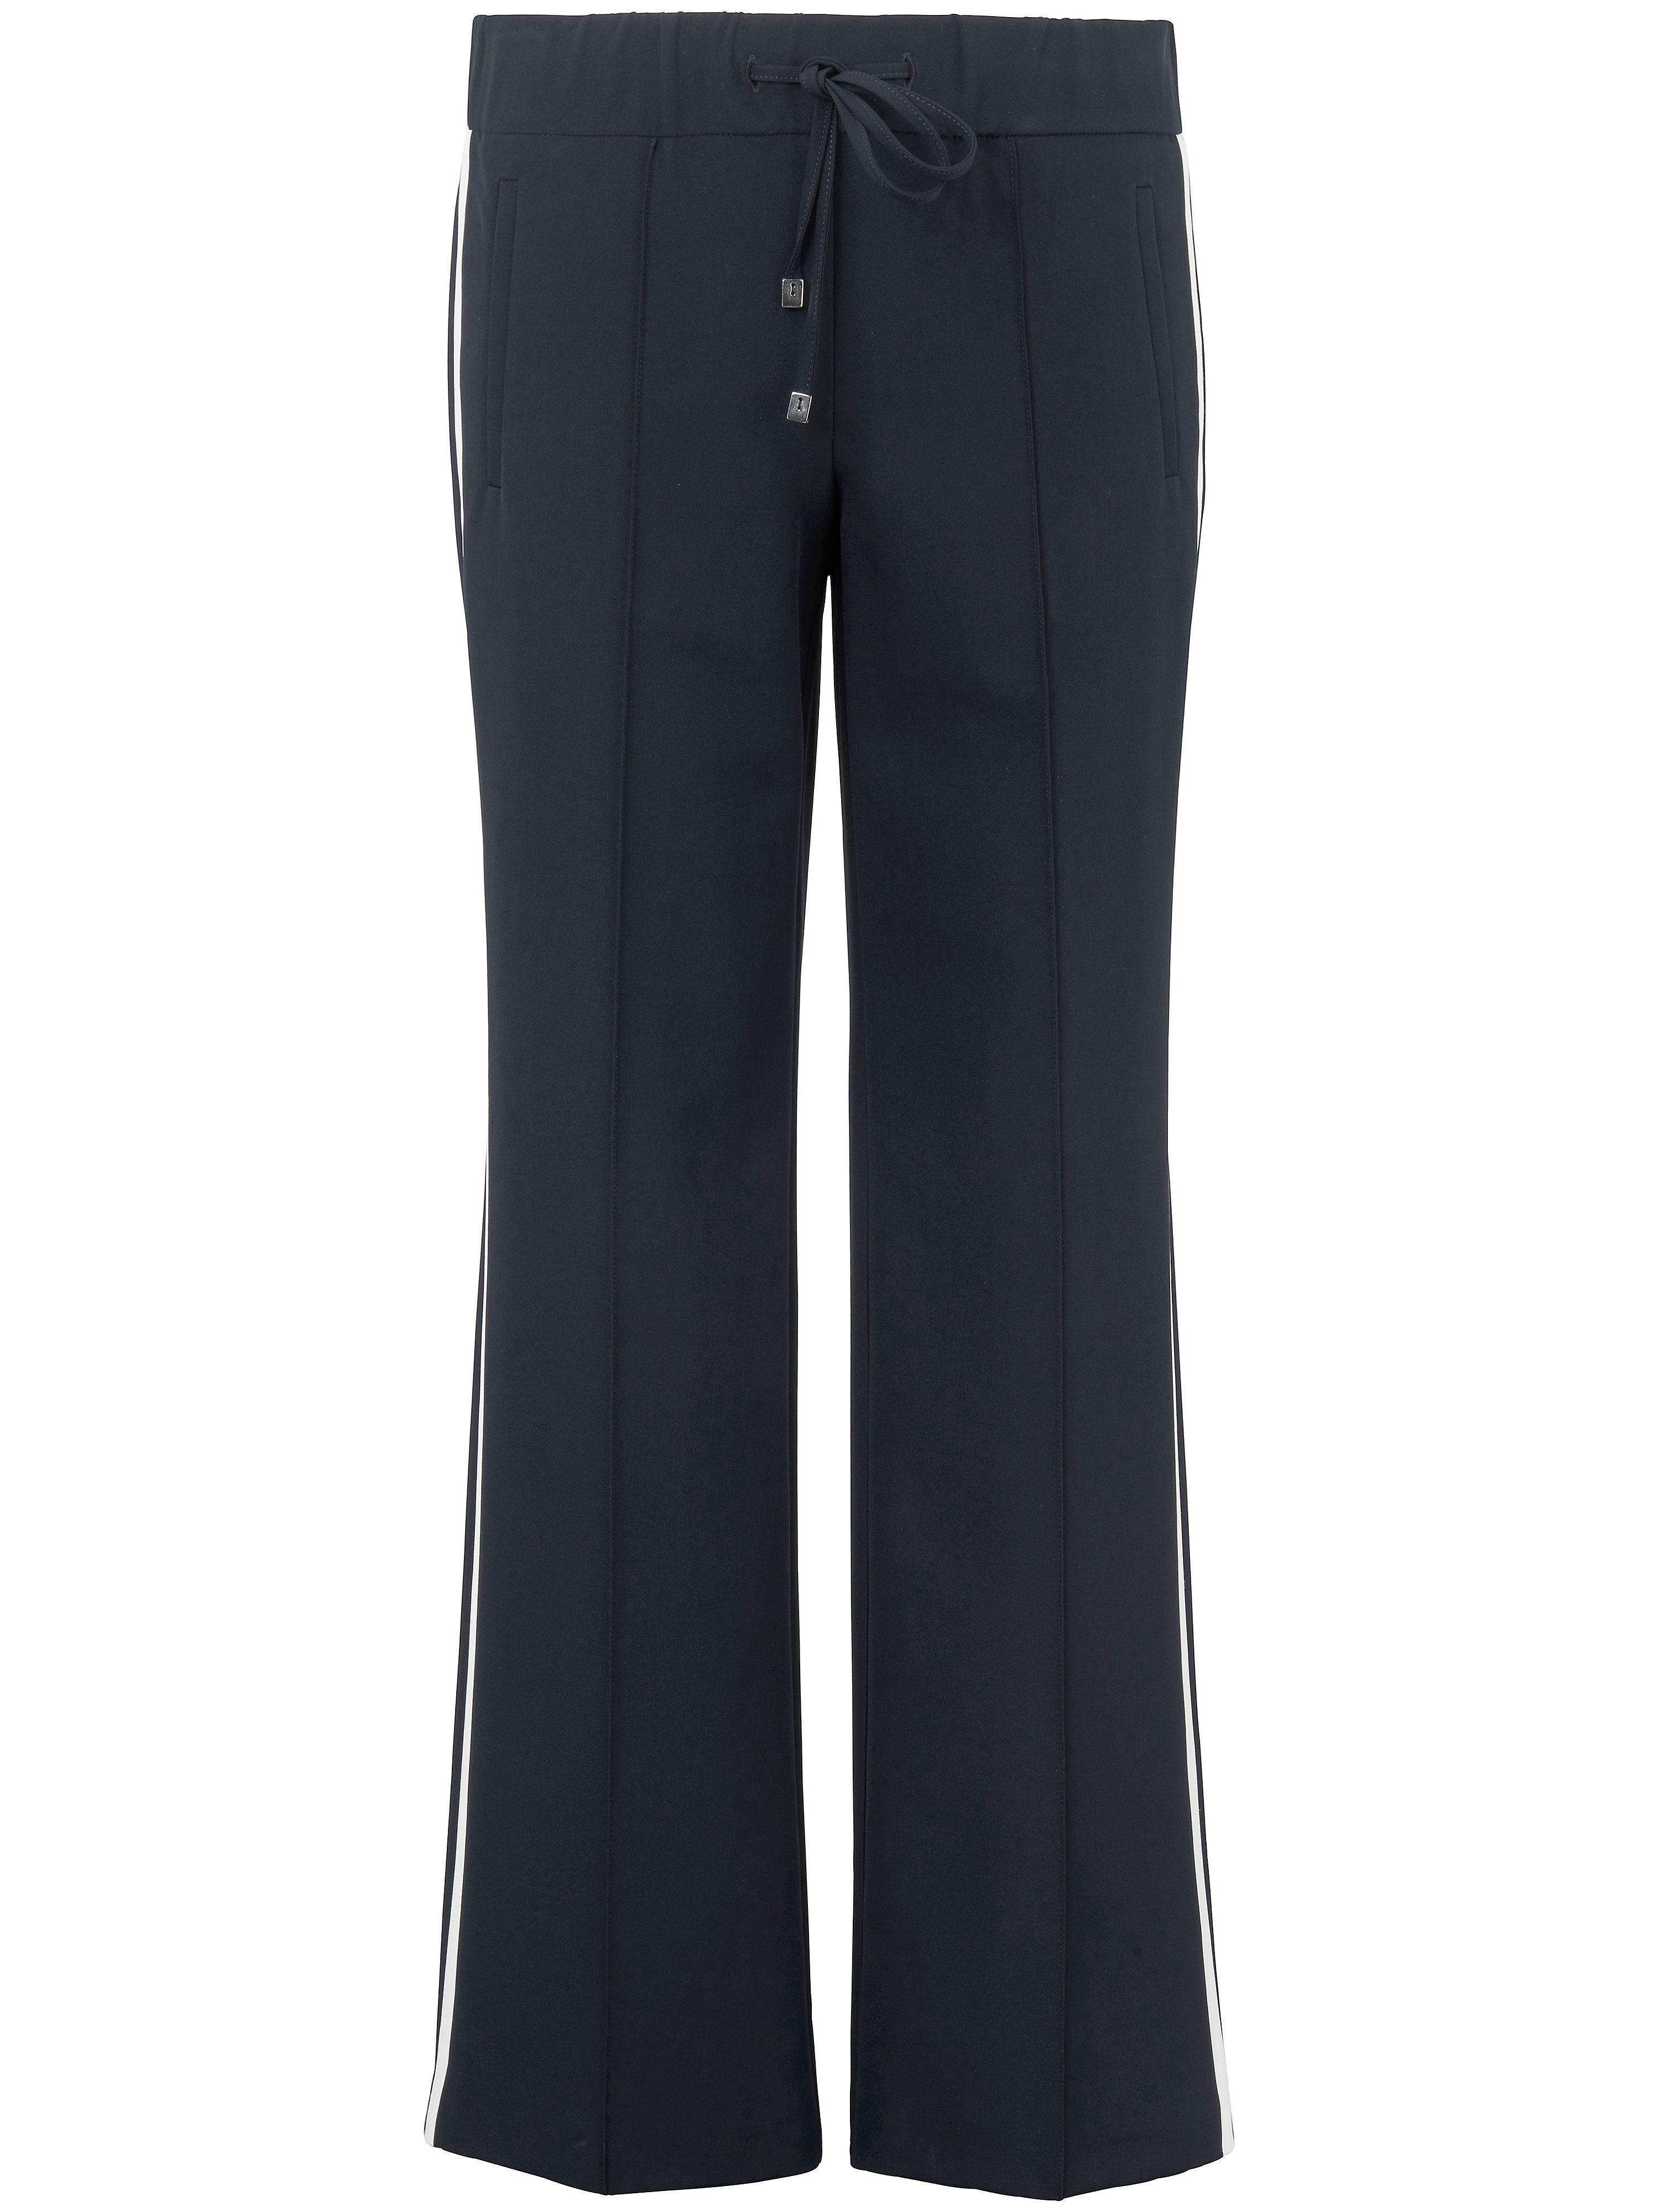 Le pantalon  Peter Hahn bleu taille 38